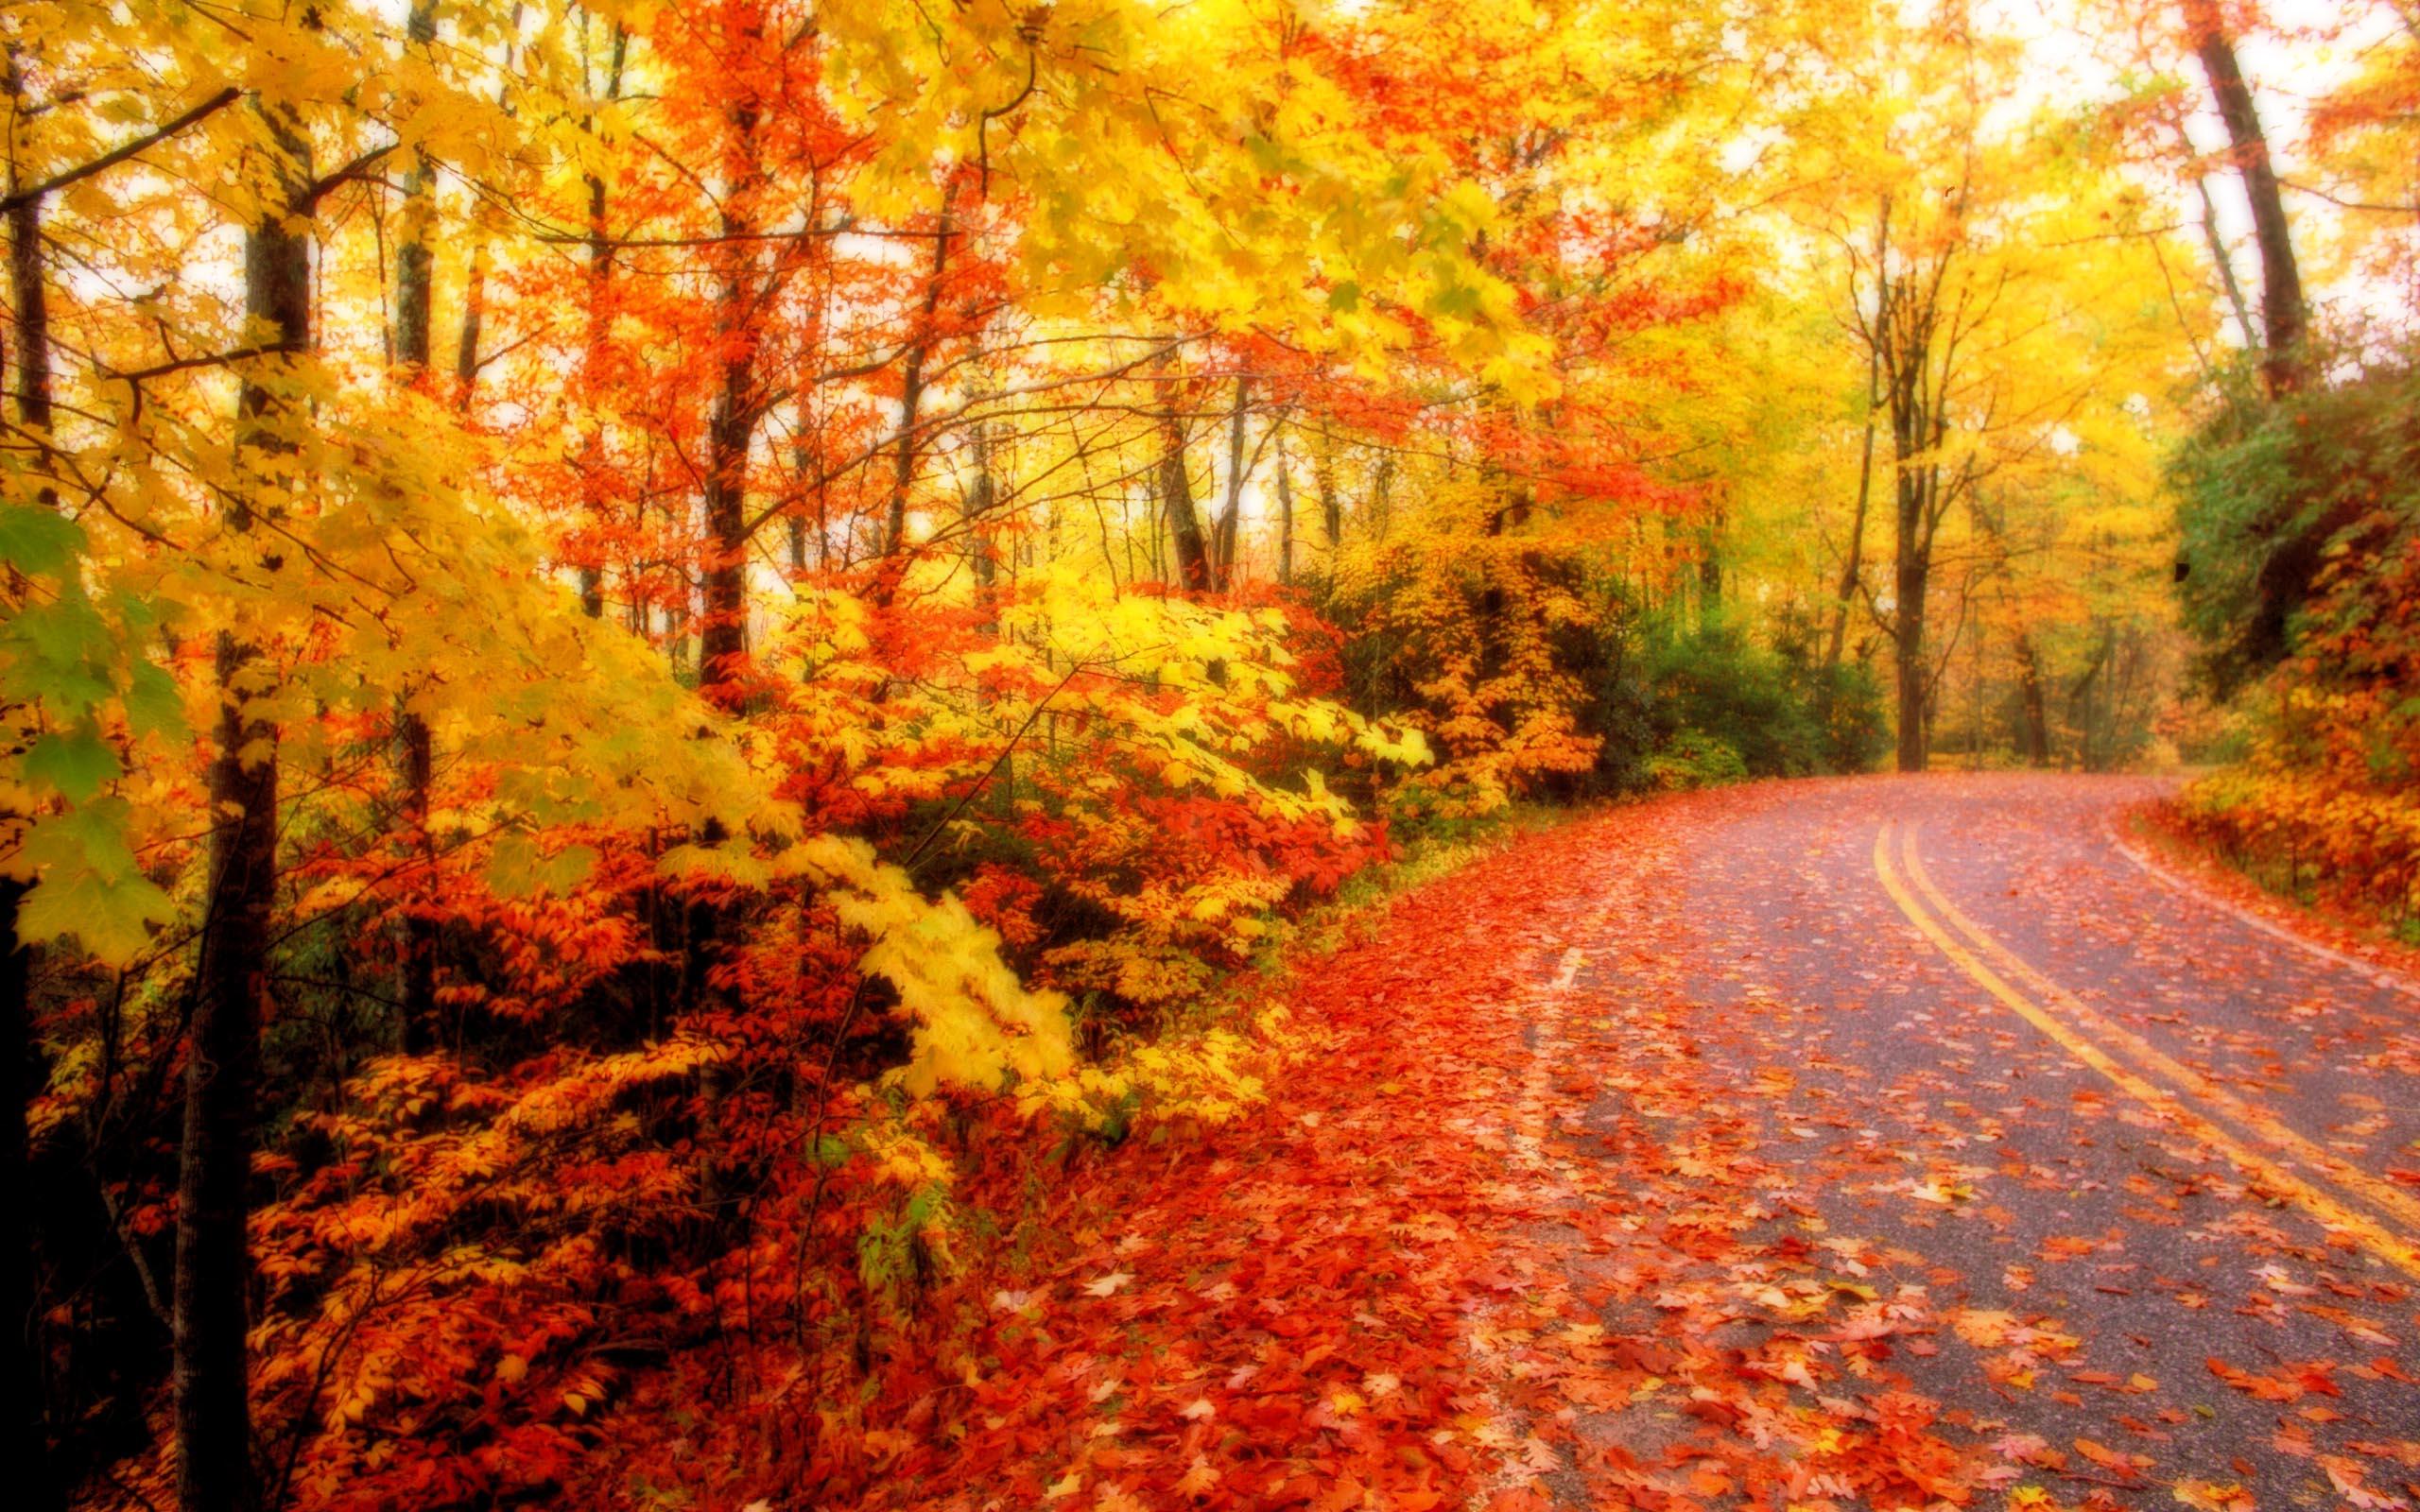 autumn leaves 2560x1600